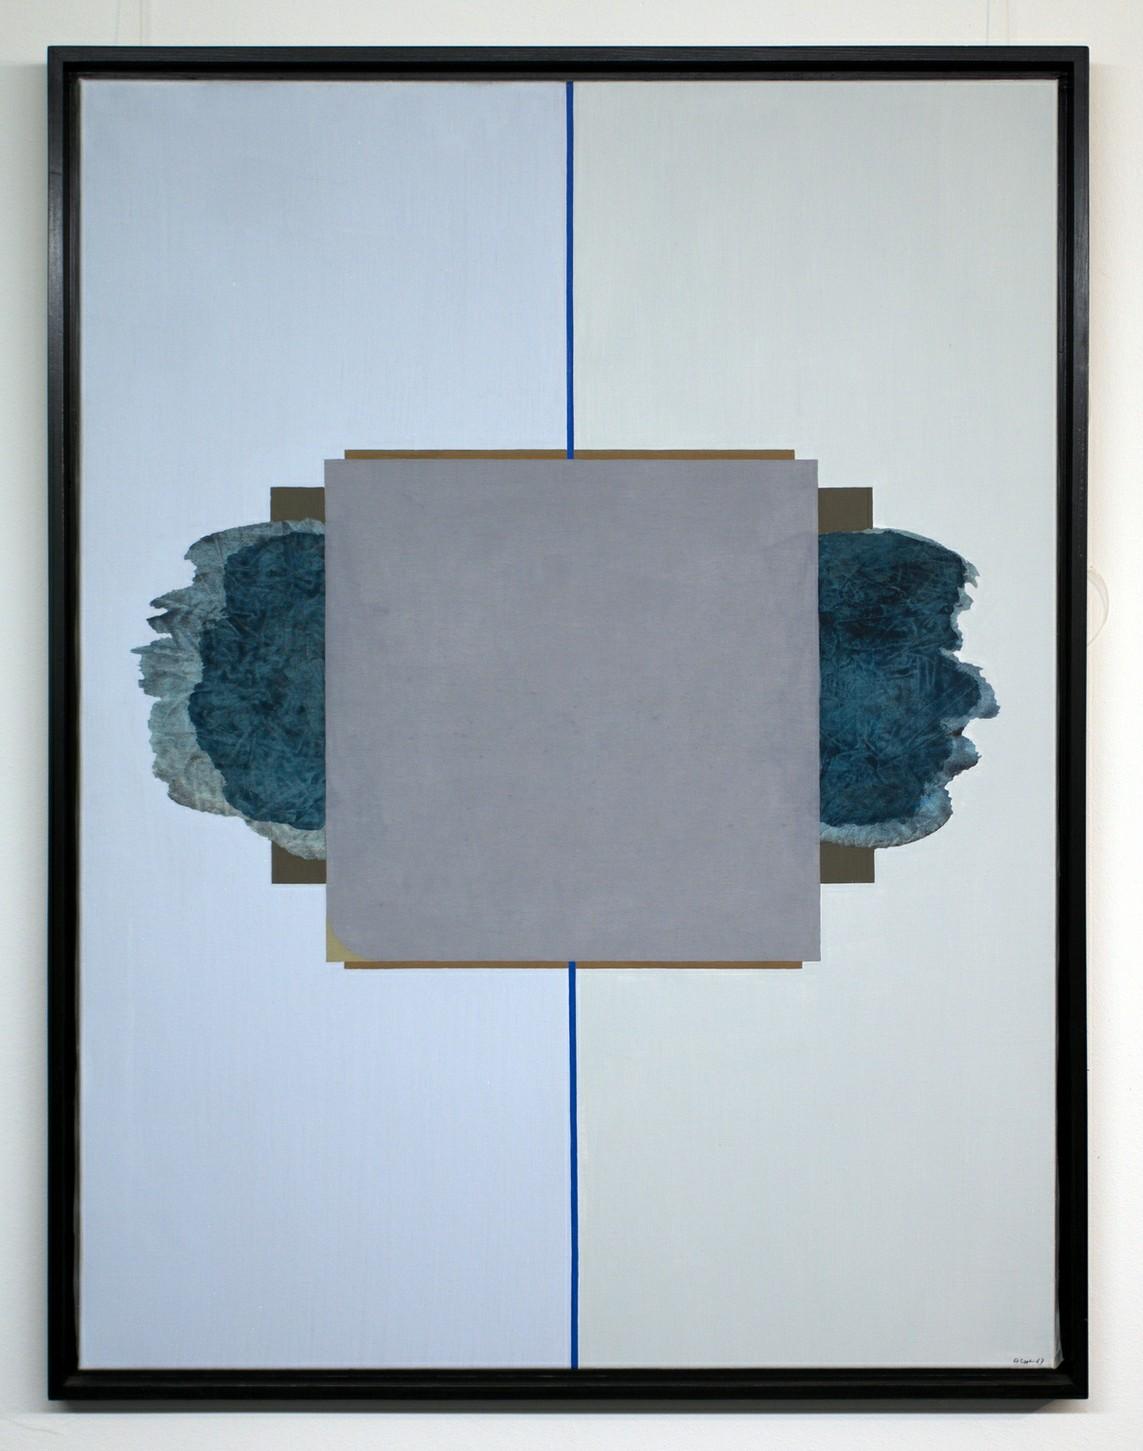 »HAUS (bedrückt)« Öl auf Leinwand, 116,5 x 89,5 cm, 1967